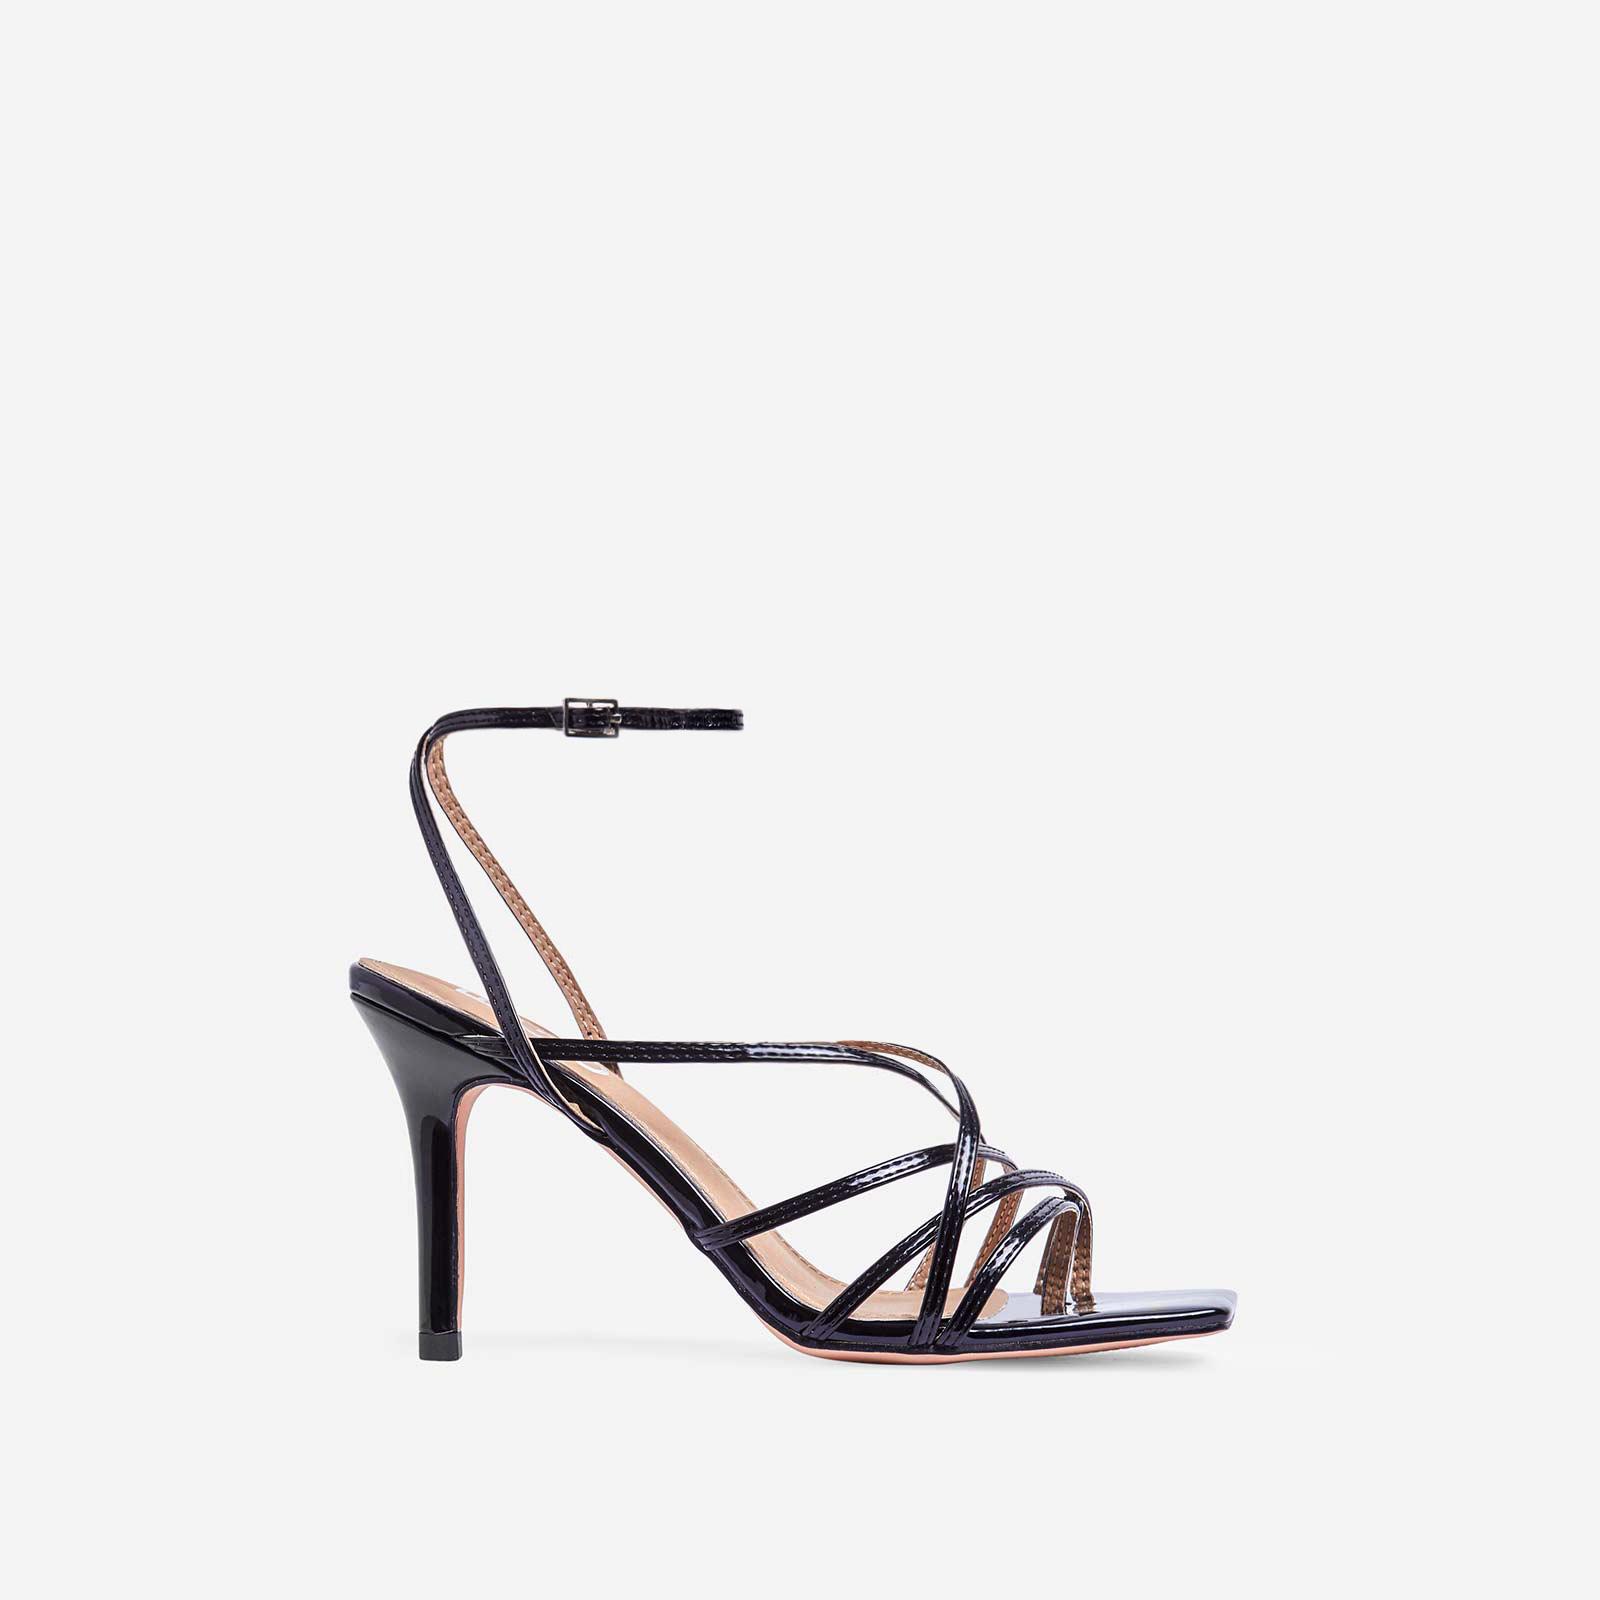 Shade Square Toe Strappy Kitten Heel In Black Patent